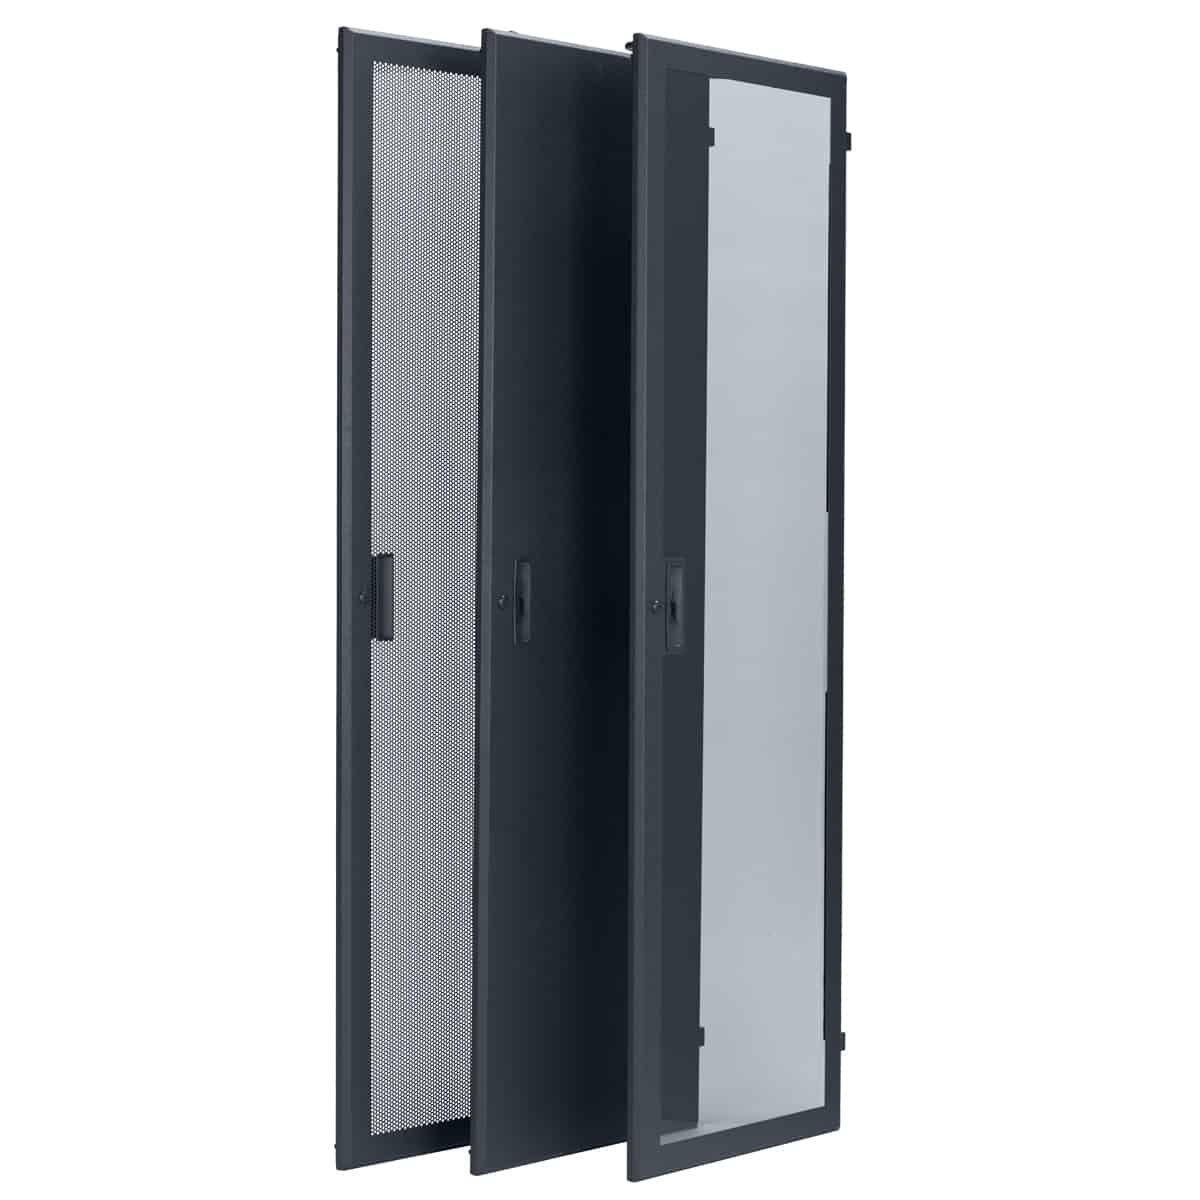 Doors & Access Covers